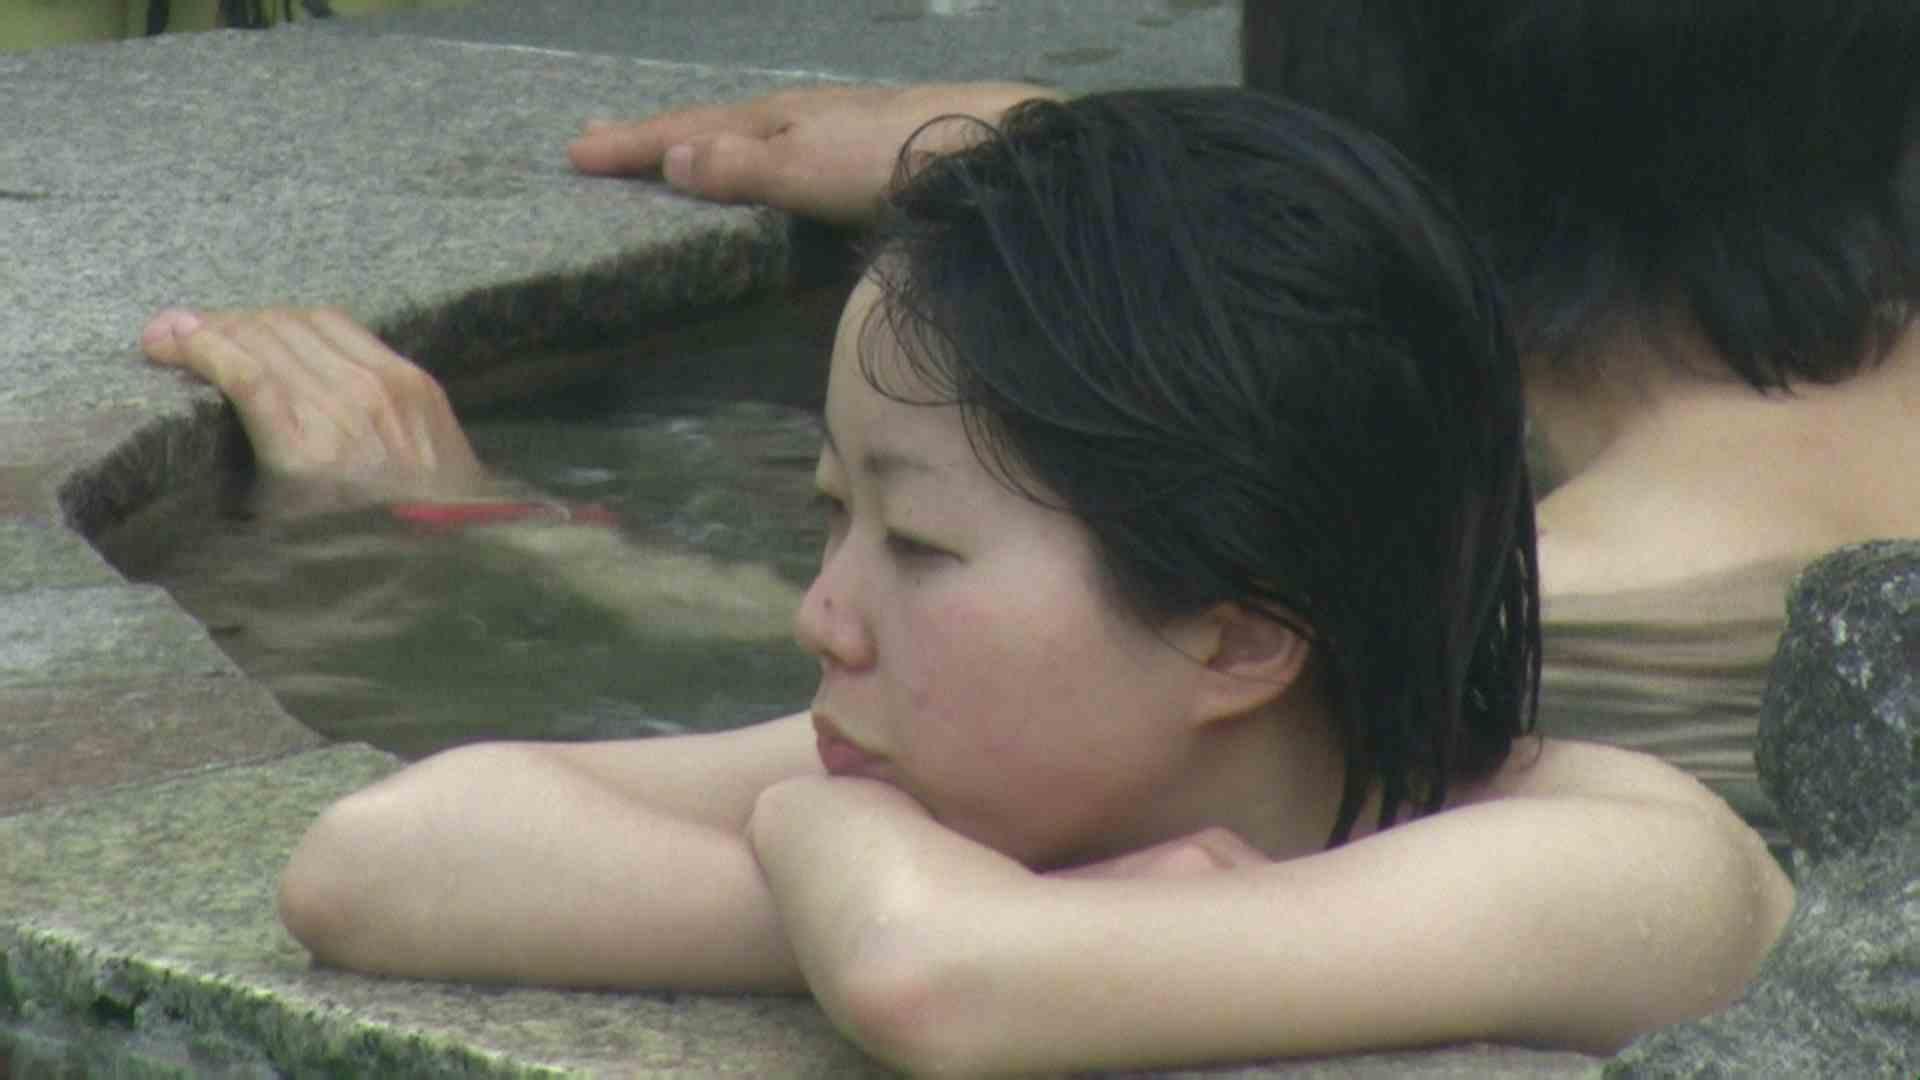 Aquaな露天風呂Vol.06【VIP】 盗撮大放出 ヌード画像 96連発 28